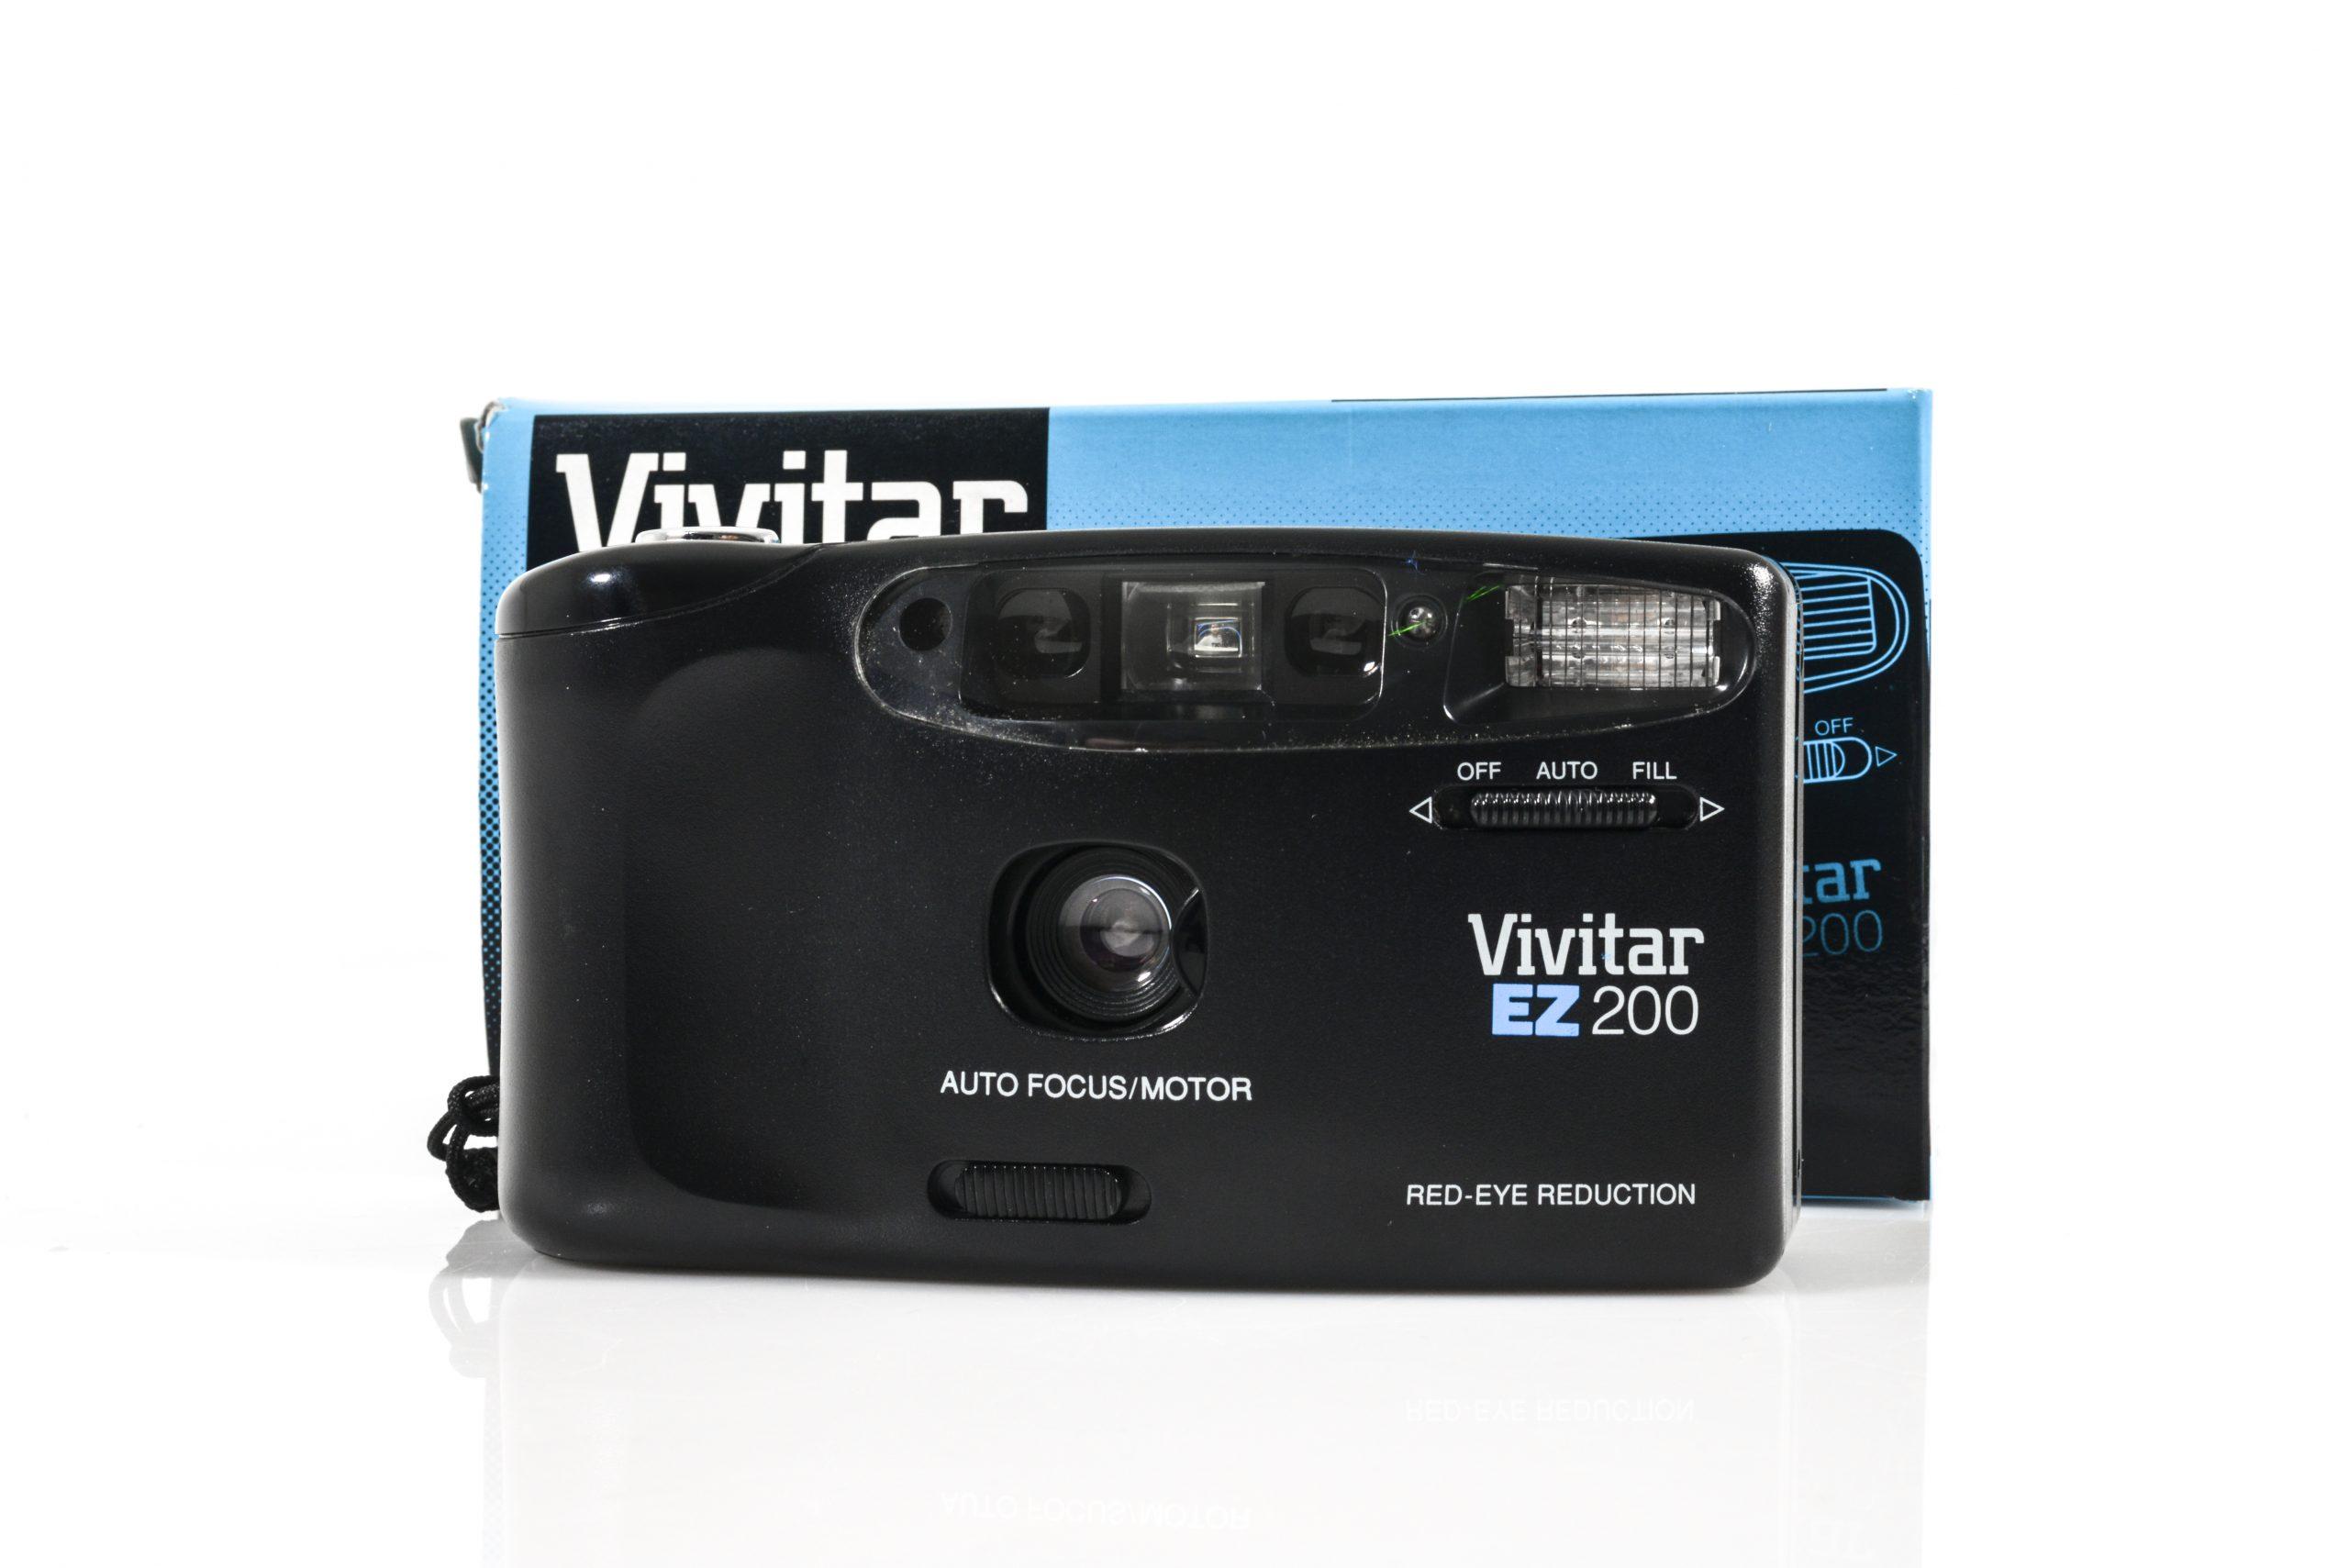 Like NEW Vivitar EZ 200 Point & Shoot 35mm Film Camera with Original Box